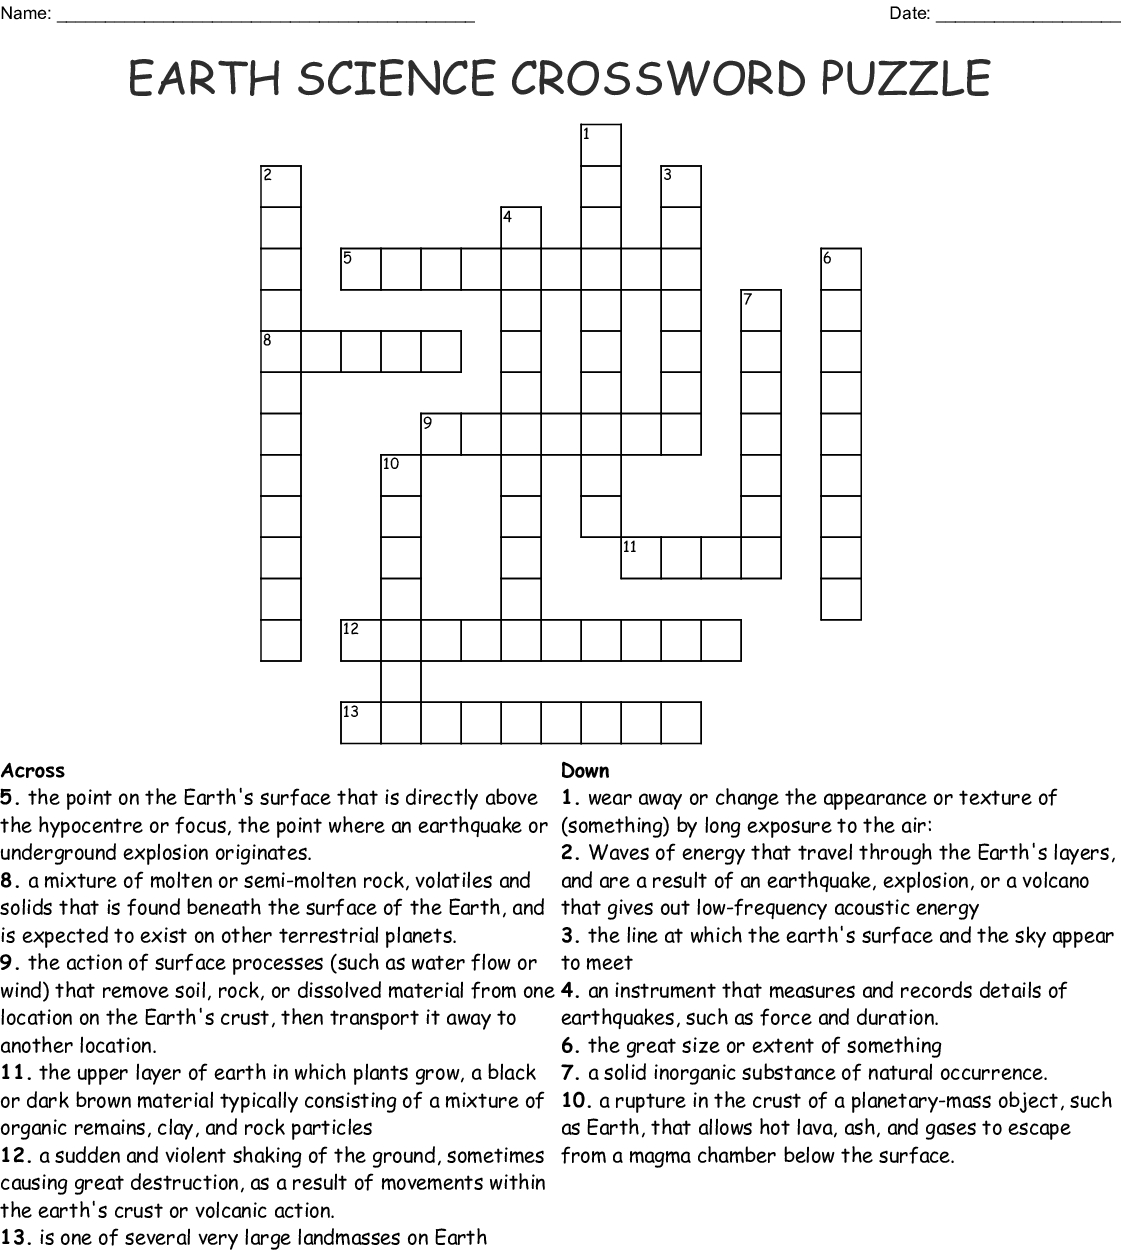 Earth Science Crossword Puzzle Crossword - Wordmint - Printable Crossword Puzzles Science